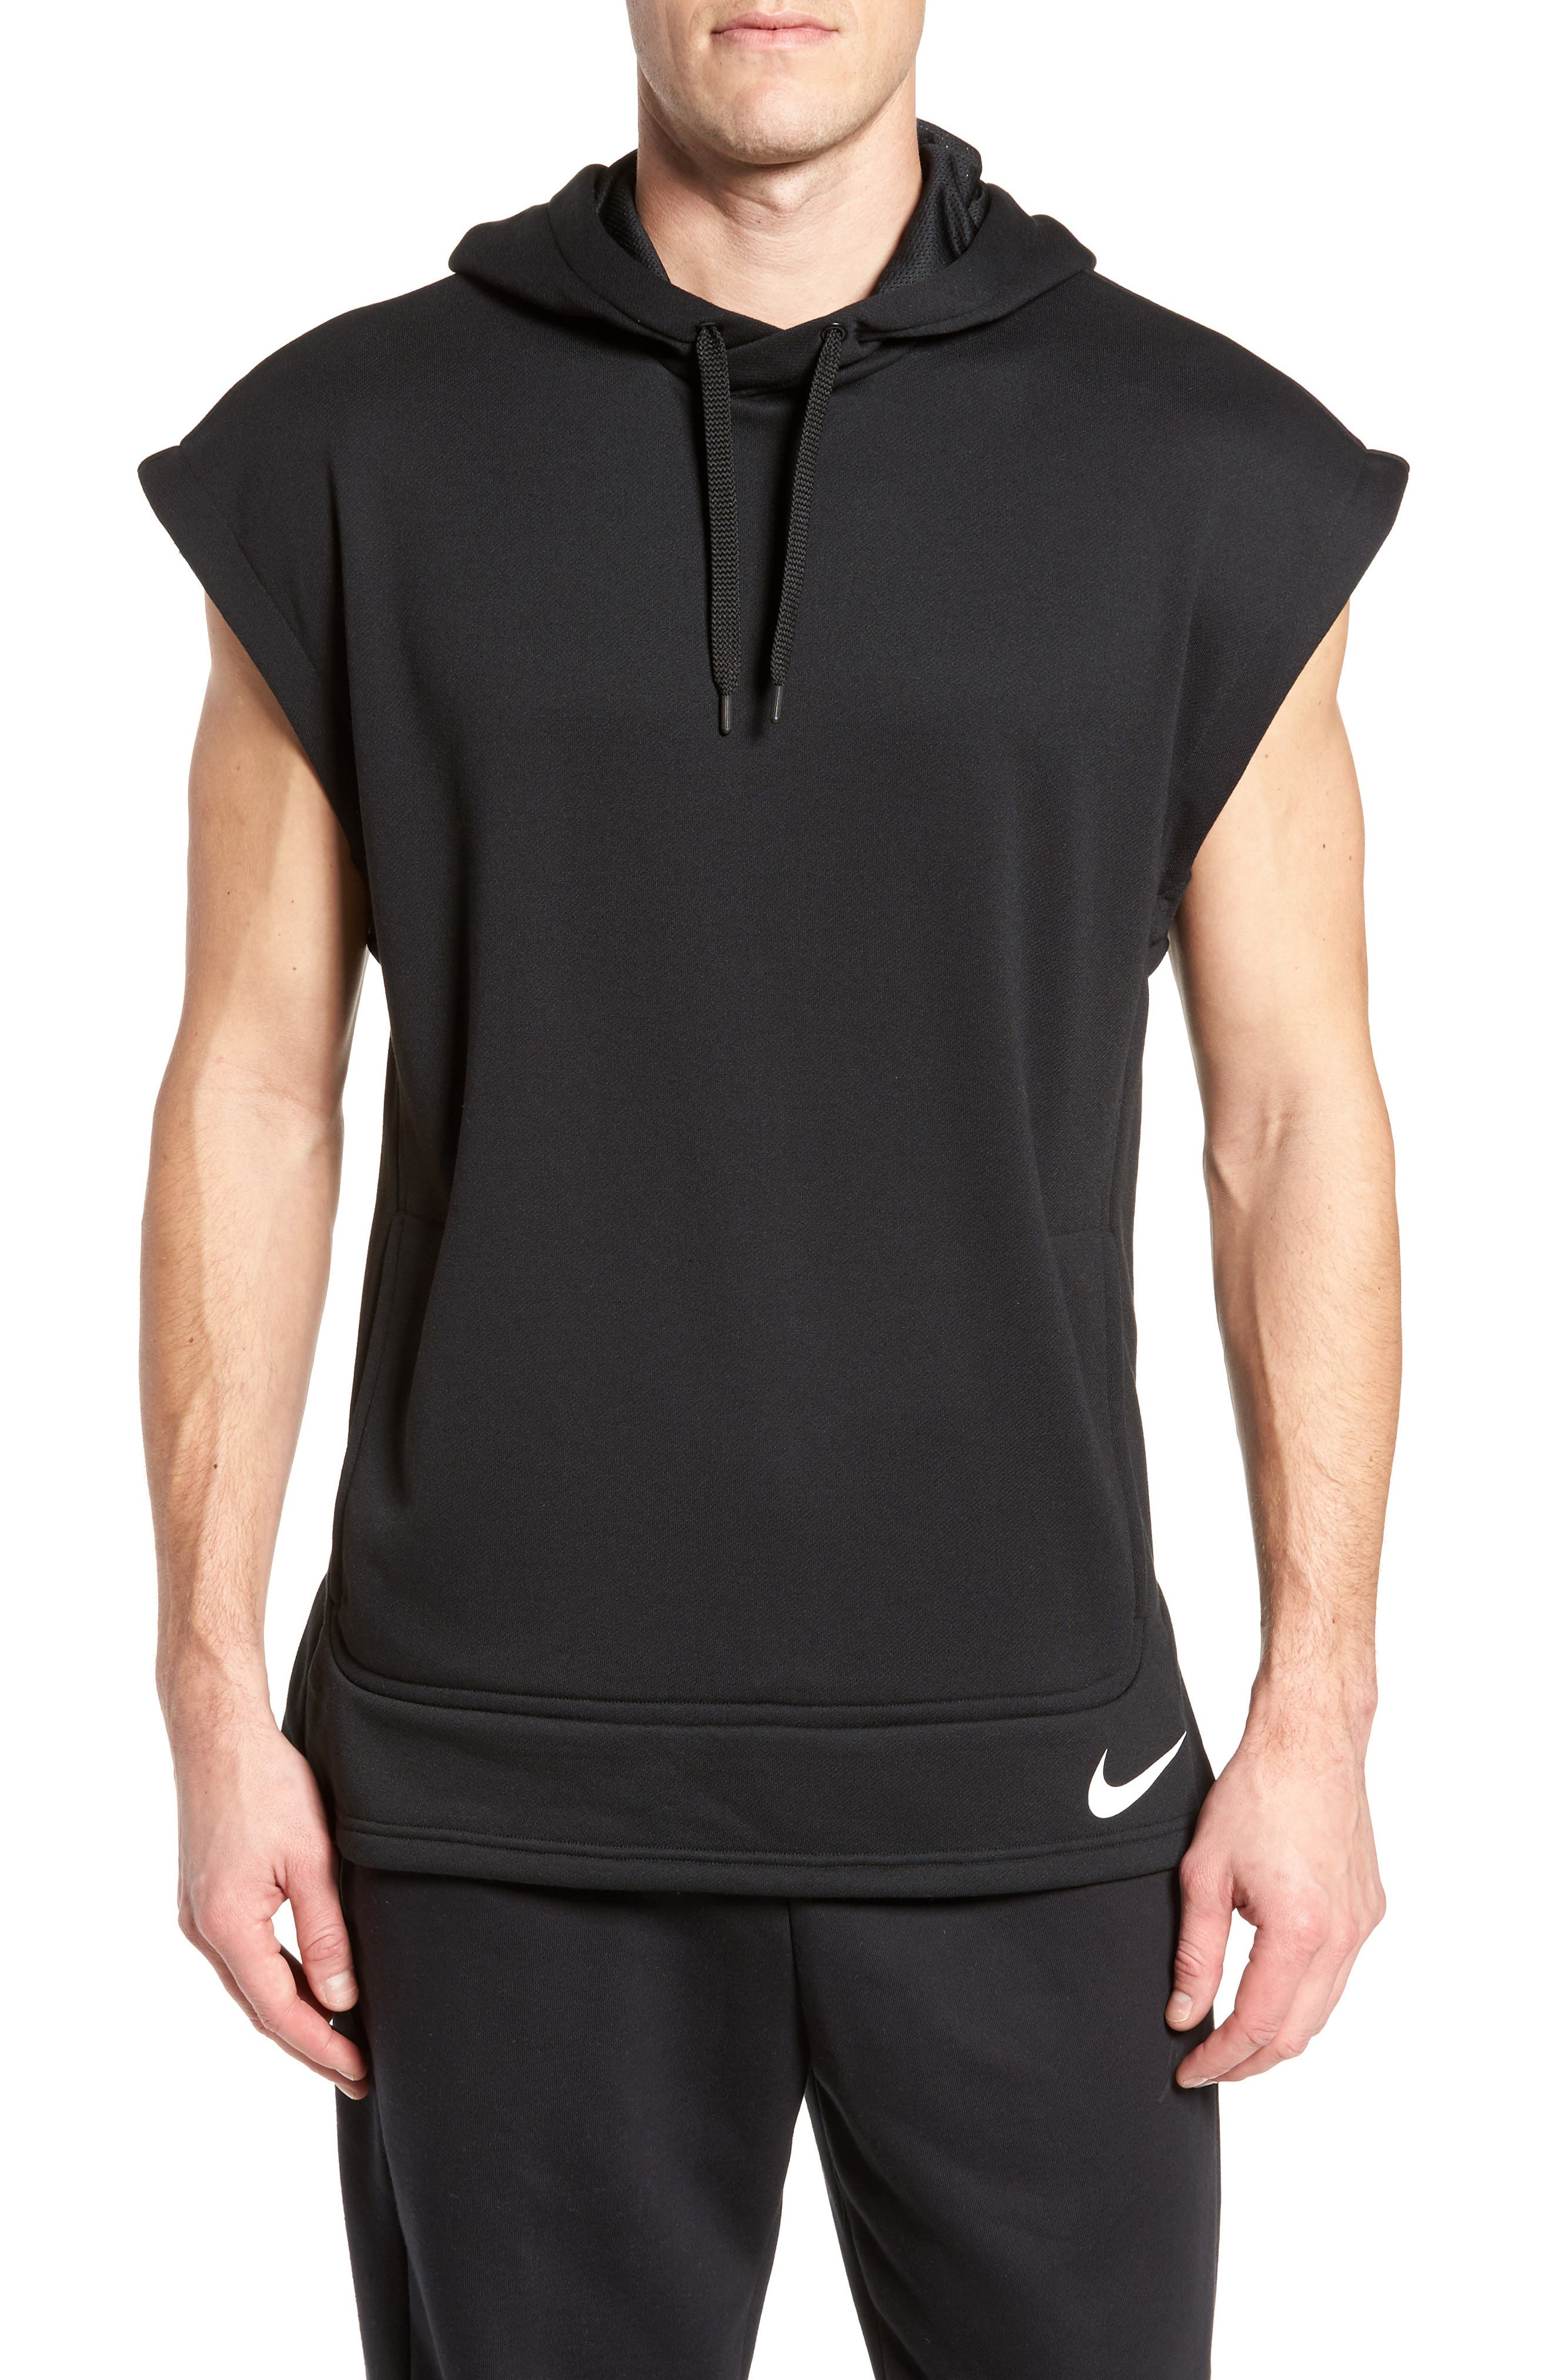 Training Dry Top PX Sleeveless Hoodie,                             Main thumbnail 1, color,                             Black/ Black/ White